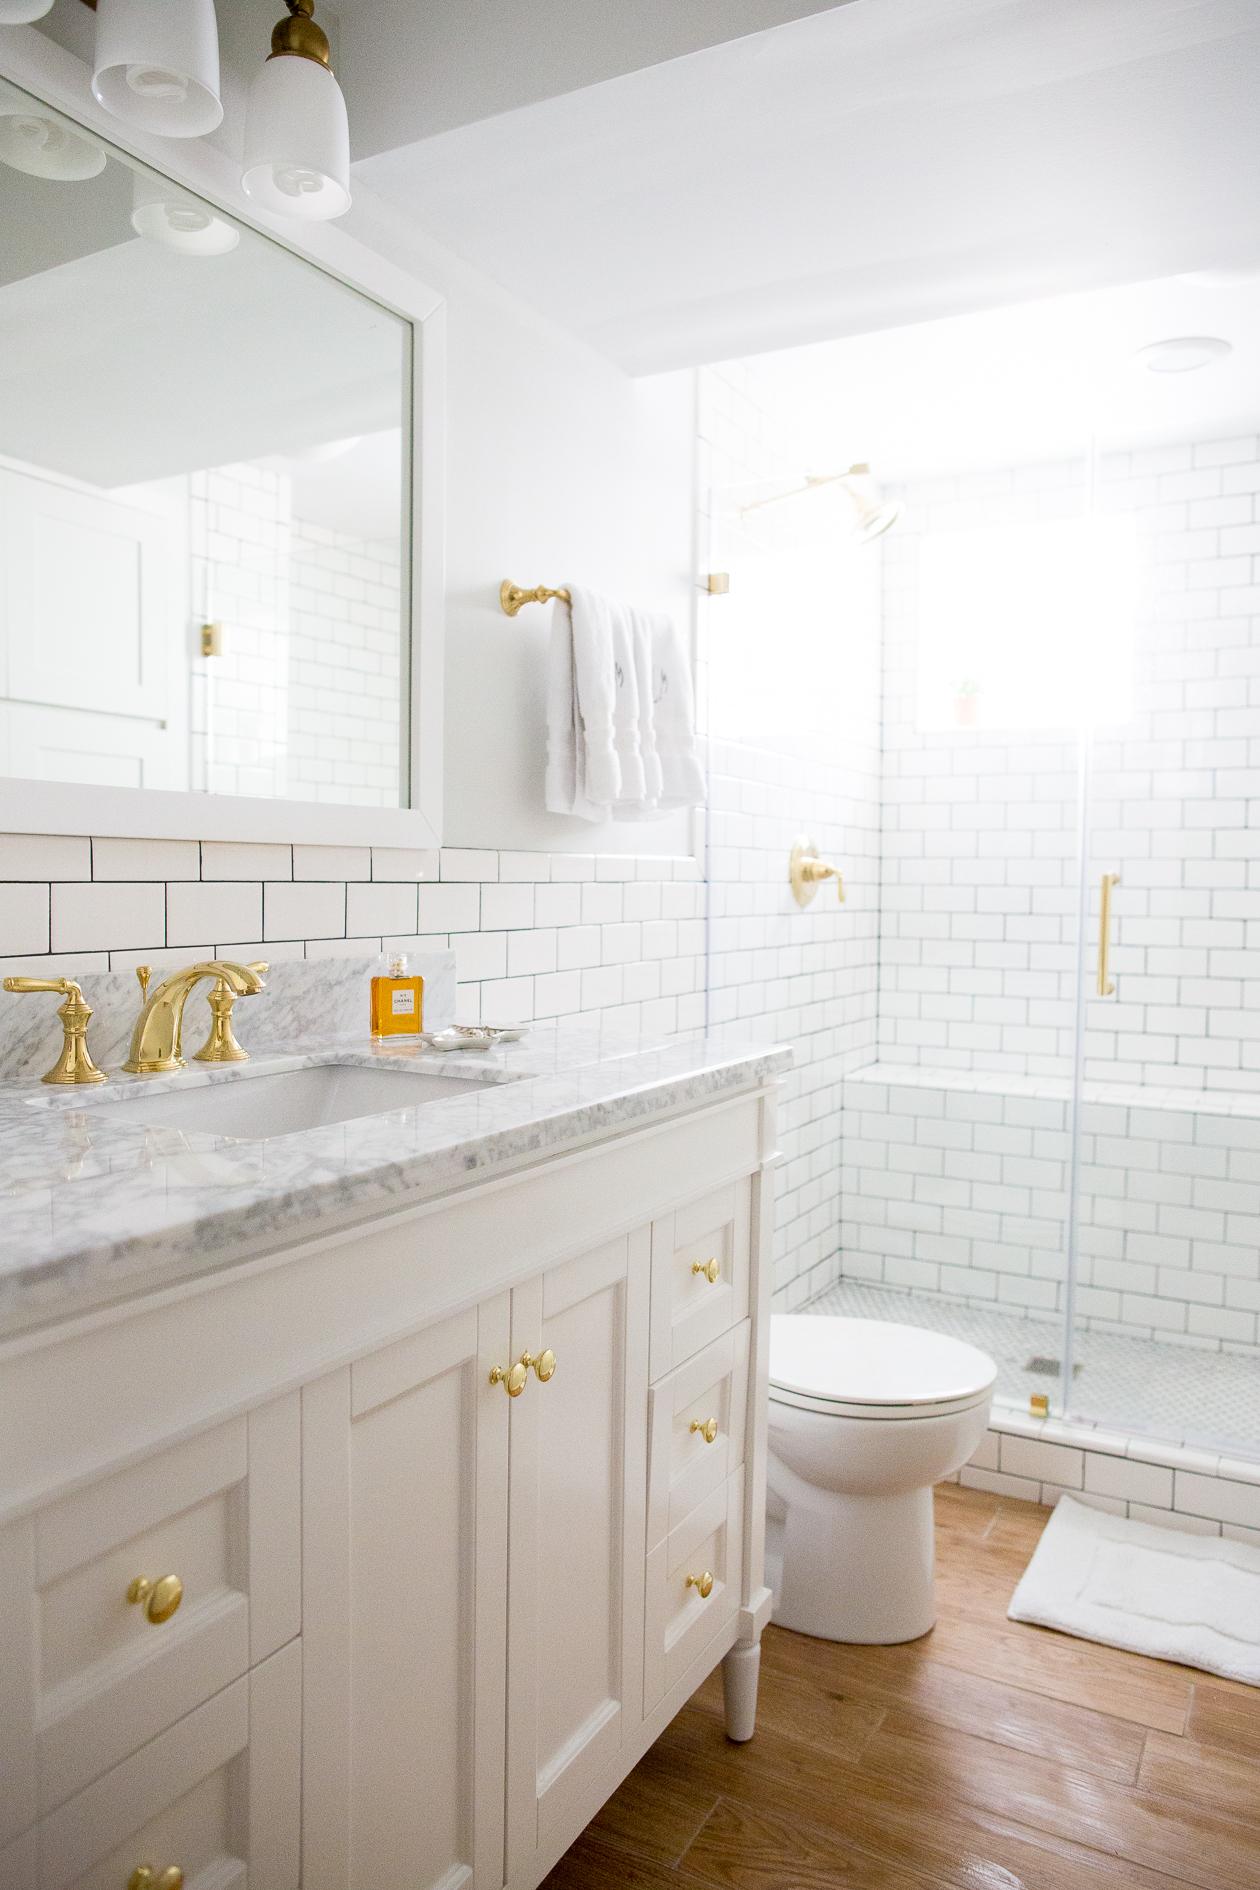 Kelly-in-the-City-Master-Bathroom-Renovation-50.jpg